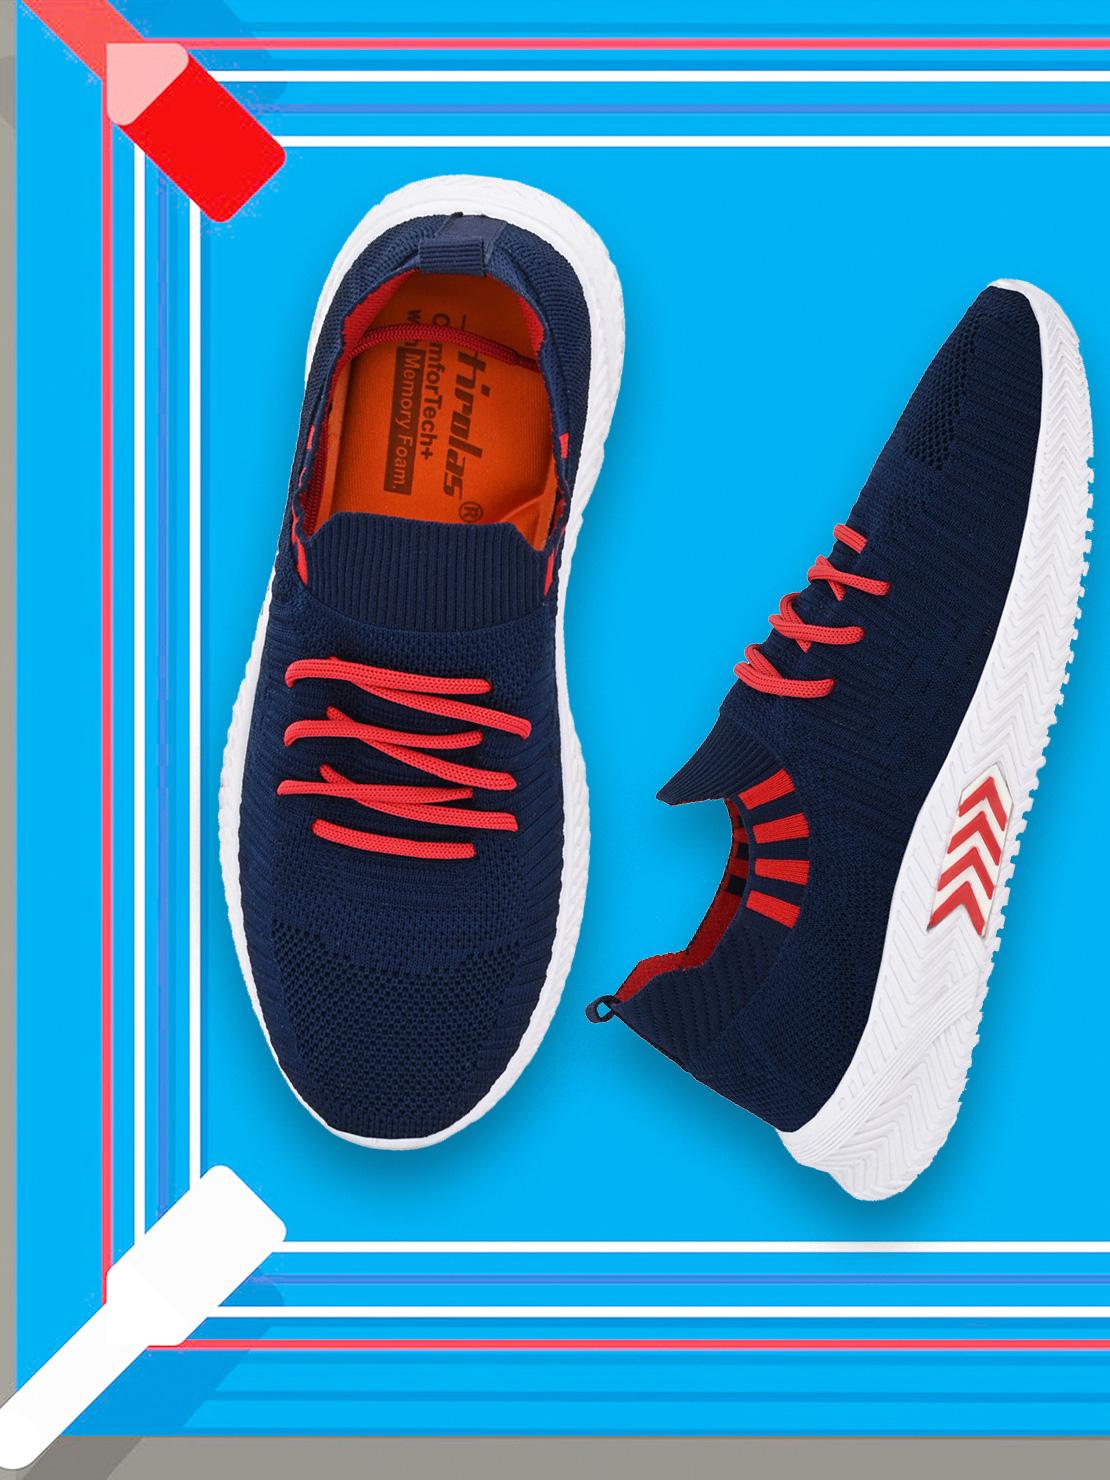 Hirolas   Hirolas® Men's Blue Knitted Running/Gym/Walking athleisure Sports Shoes